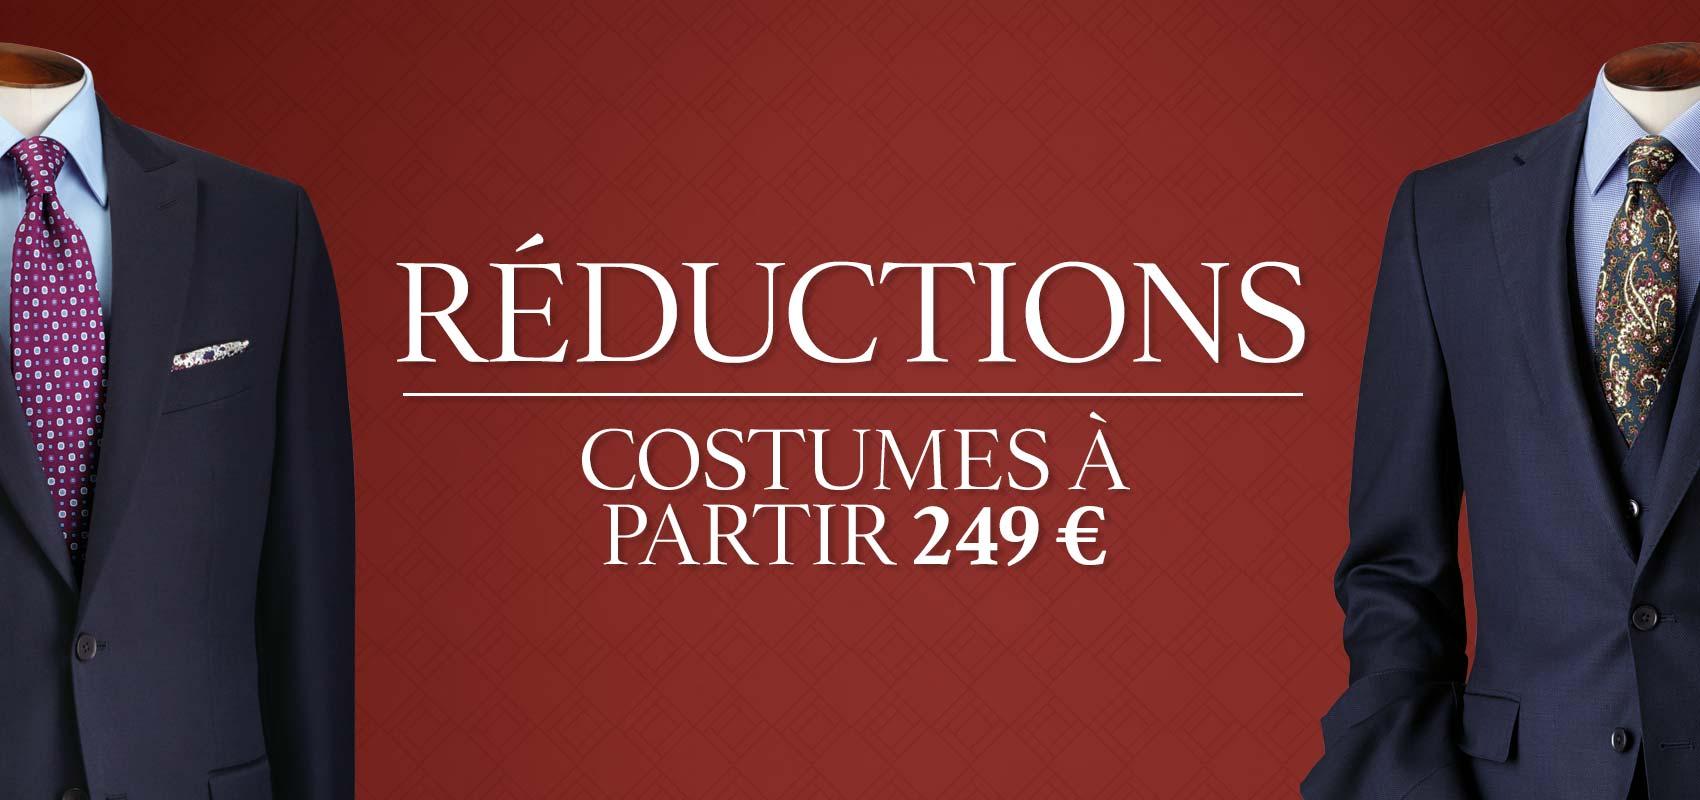 Charles Tyrwhitt costumes en tissu œil-de-perdrix